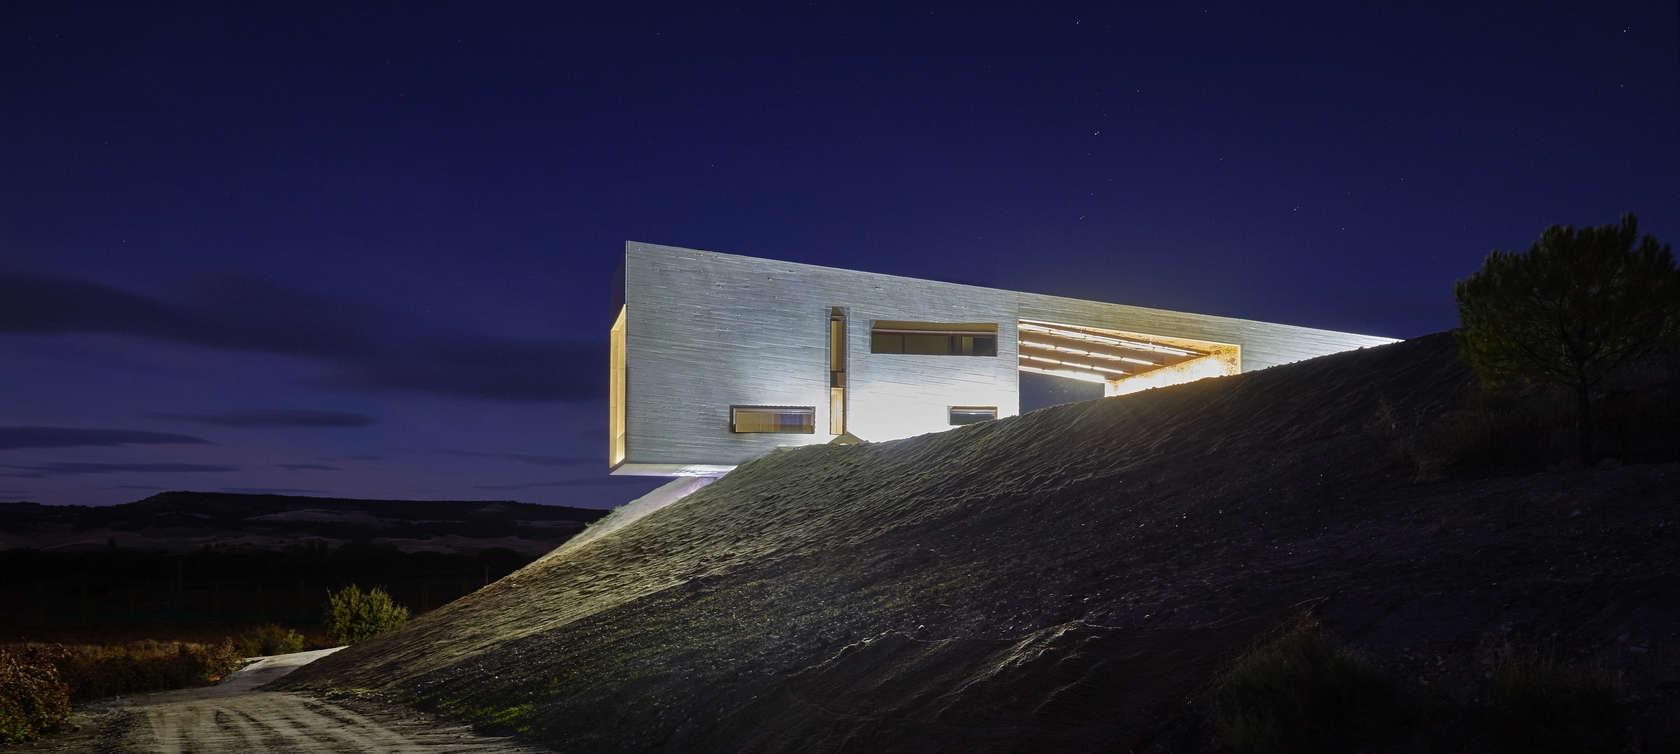 Bodega Valdemonjas Premios arquitectura Ana Agag Silvia Paredes8 1680x754 c